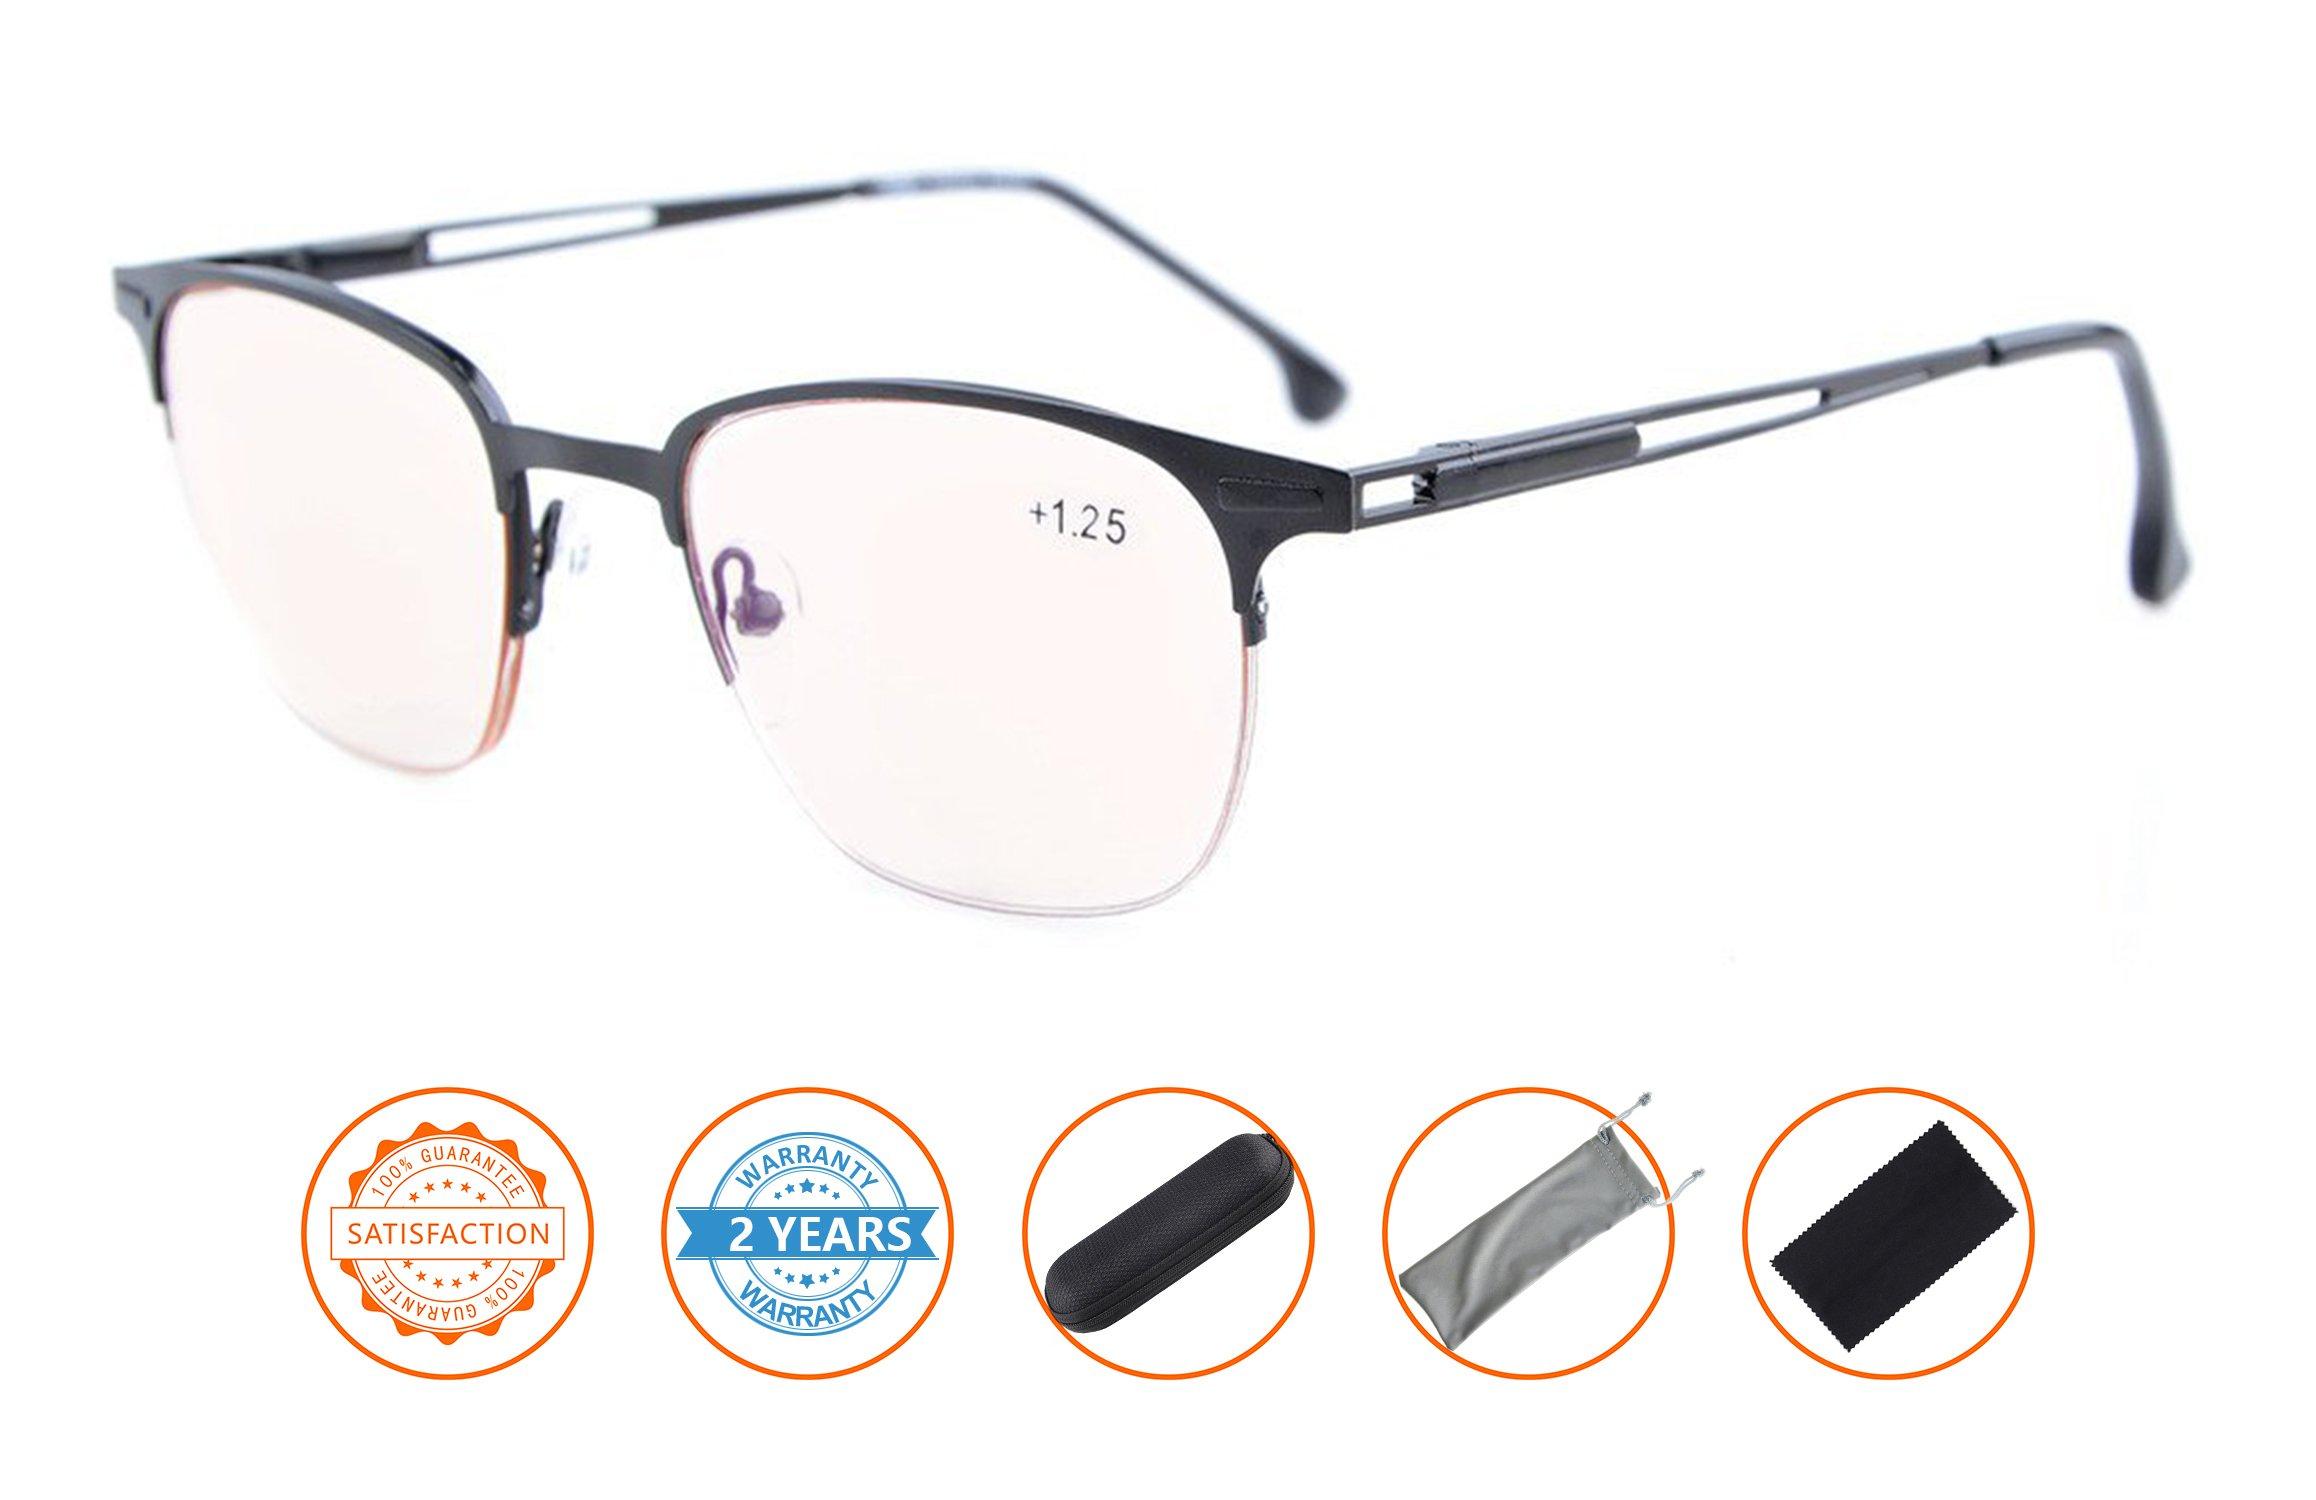 UV Protection,Anti Blue Rays,Reduce Eyestrain,Half-Rim Computer Reading Glasses(Black,Amber Tinted Lenses) +1.0